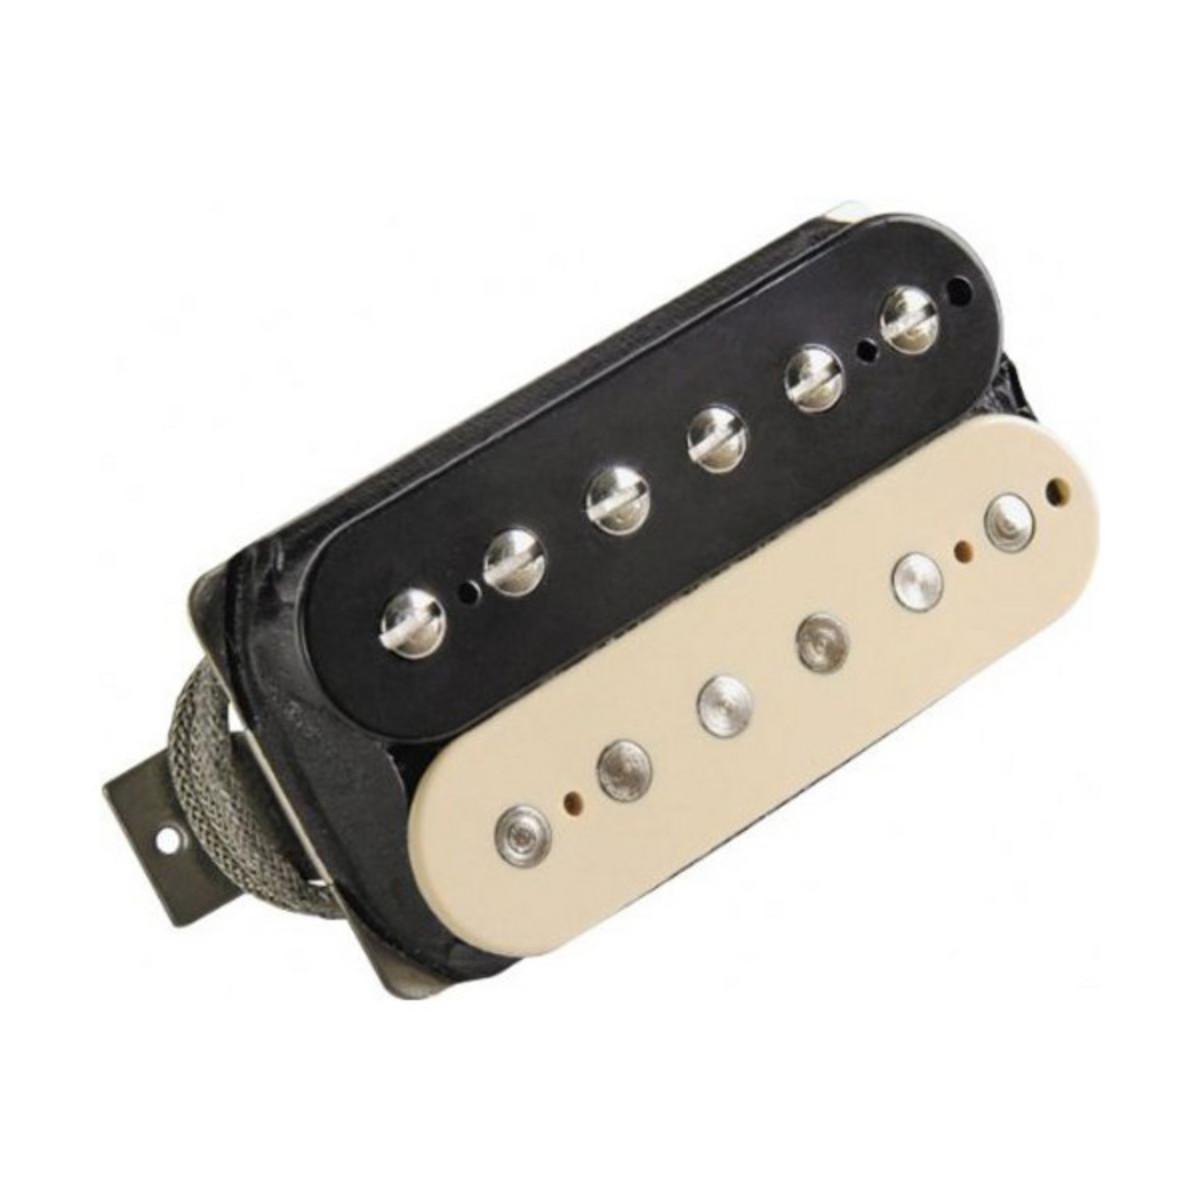 DISC Gibson 490R Modern Classic Humbucker Pickup (Neck), Zebra